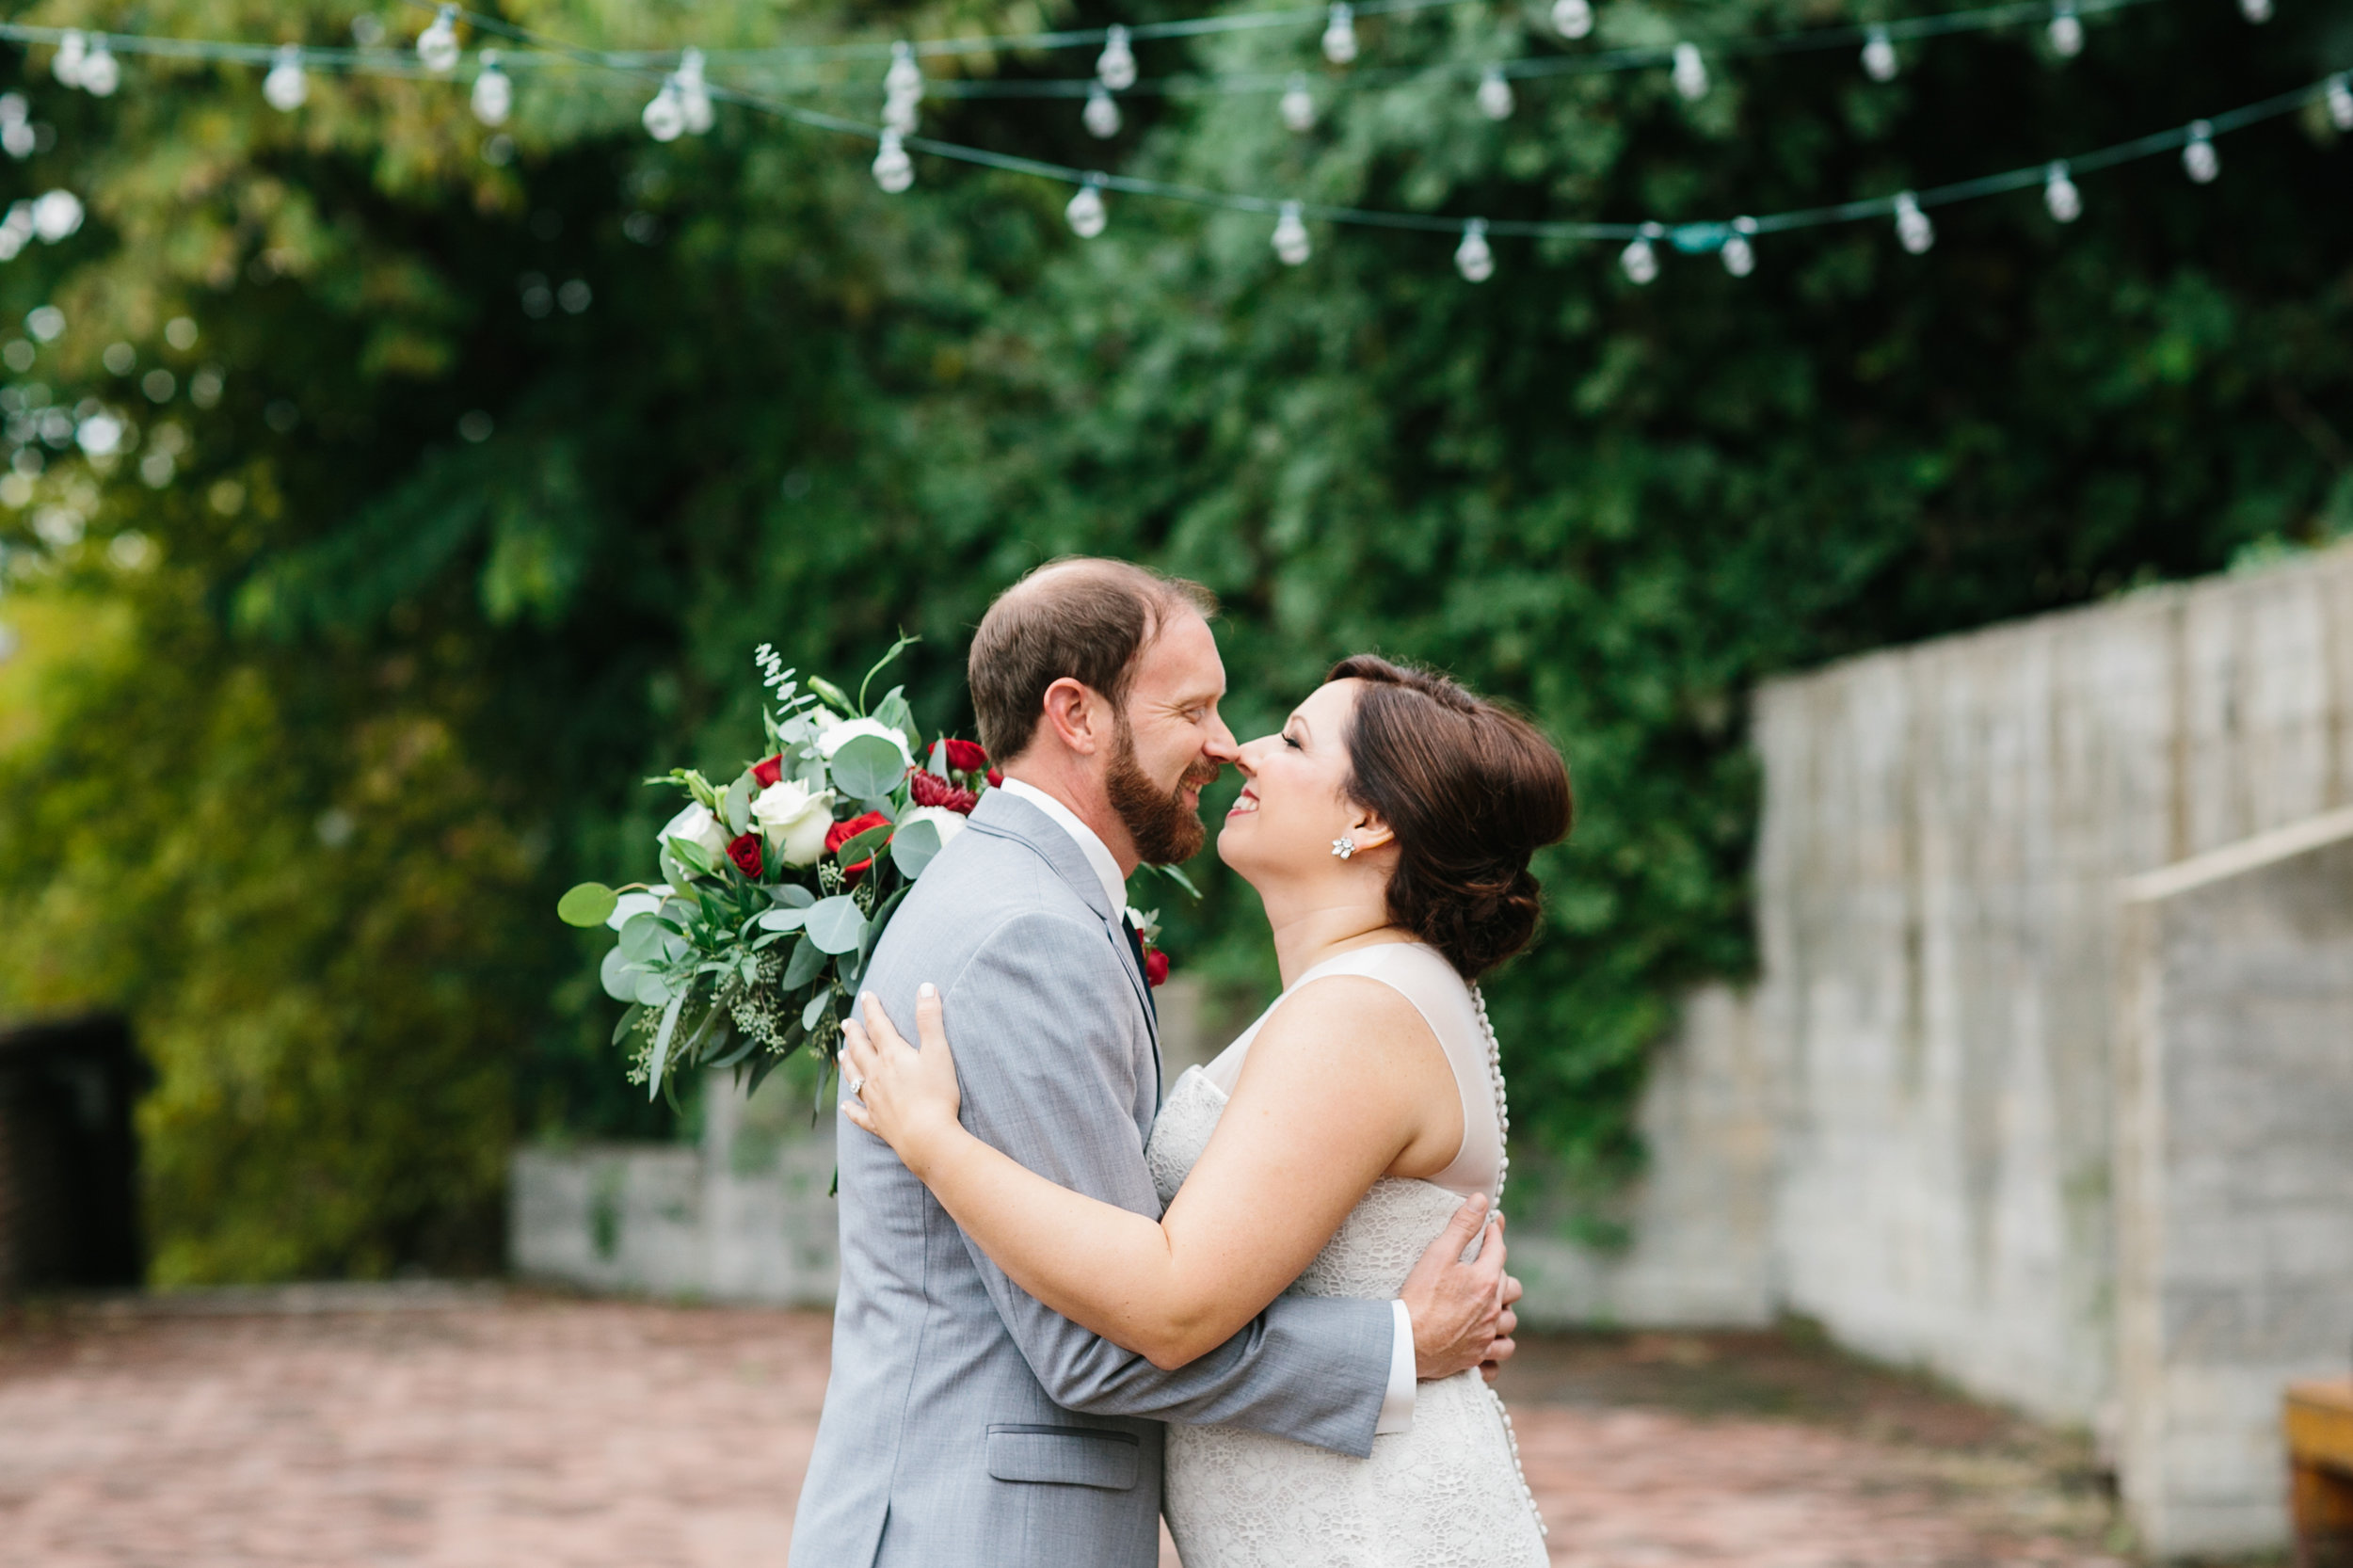 Jessica_Bryan_Wedding_Standard_Knoxville_Abigail_Malone_Photography-194-2.jpg